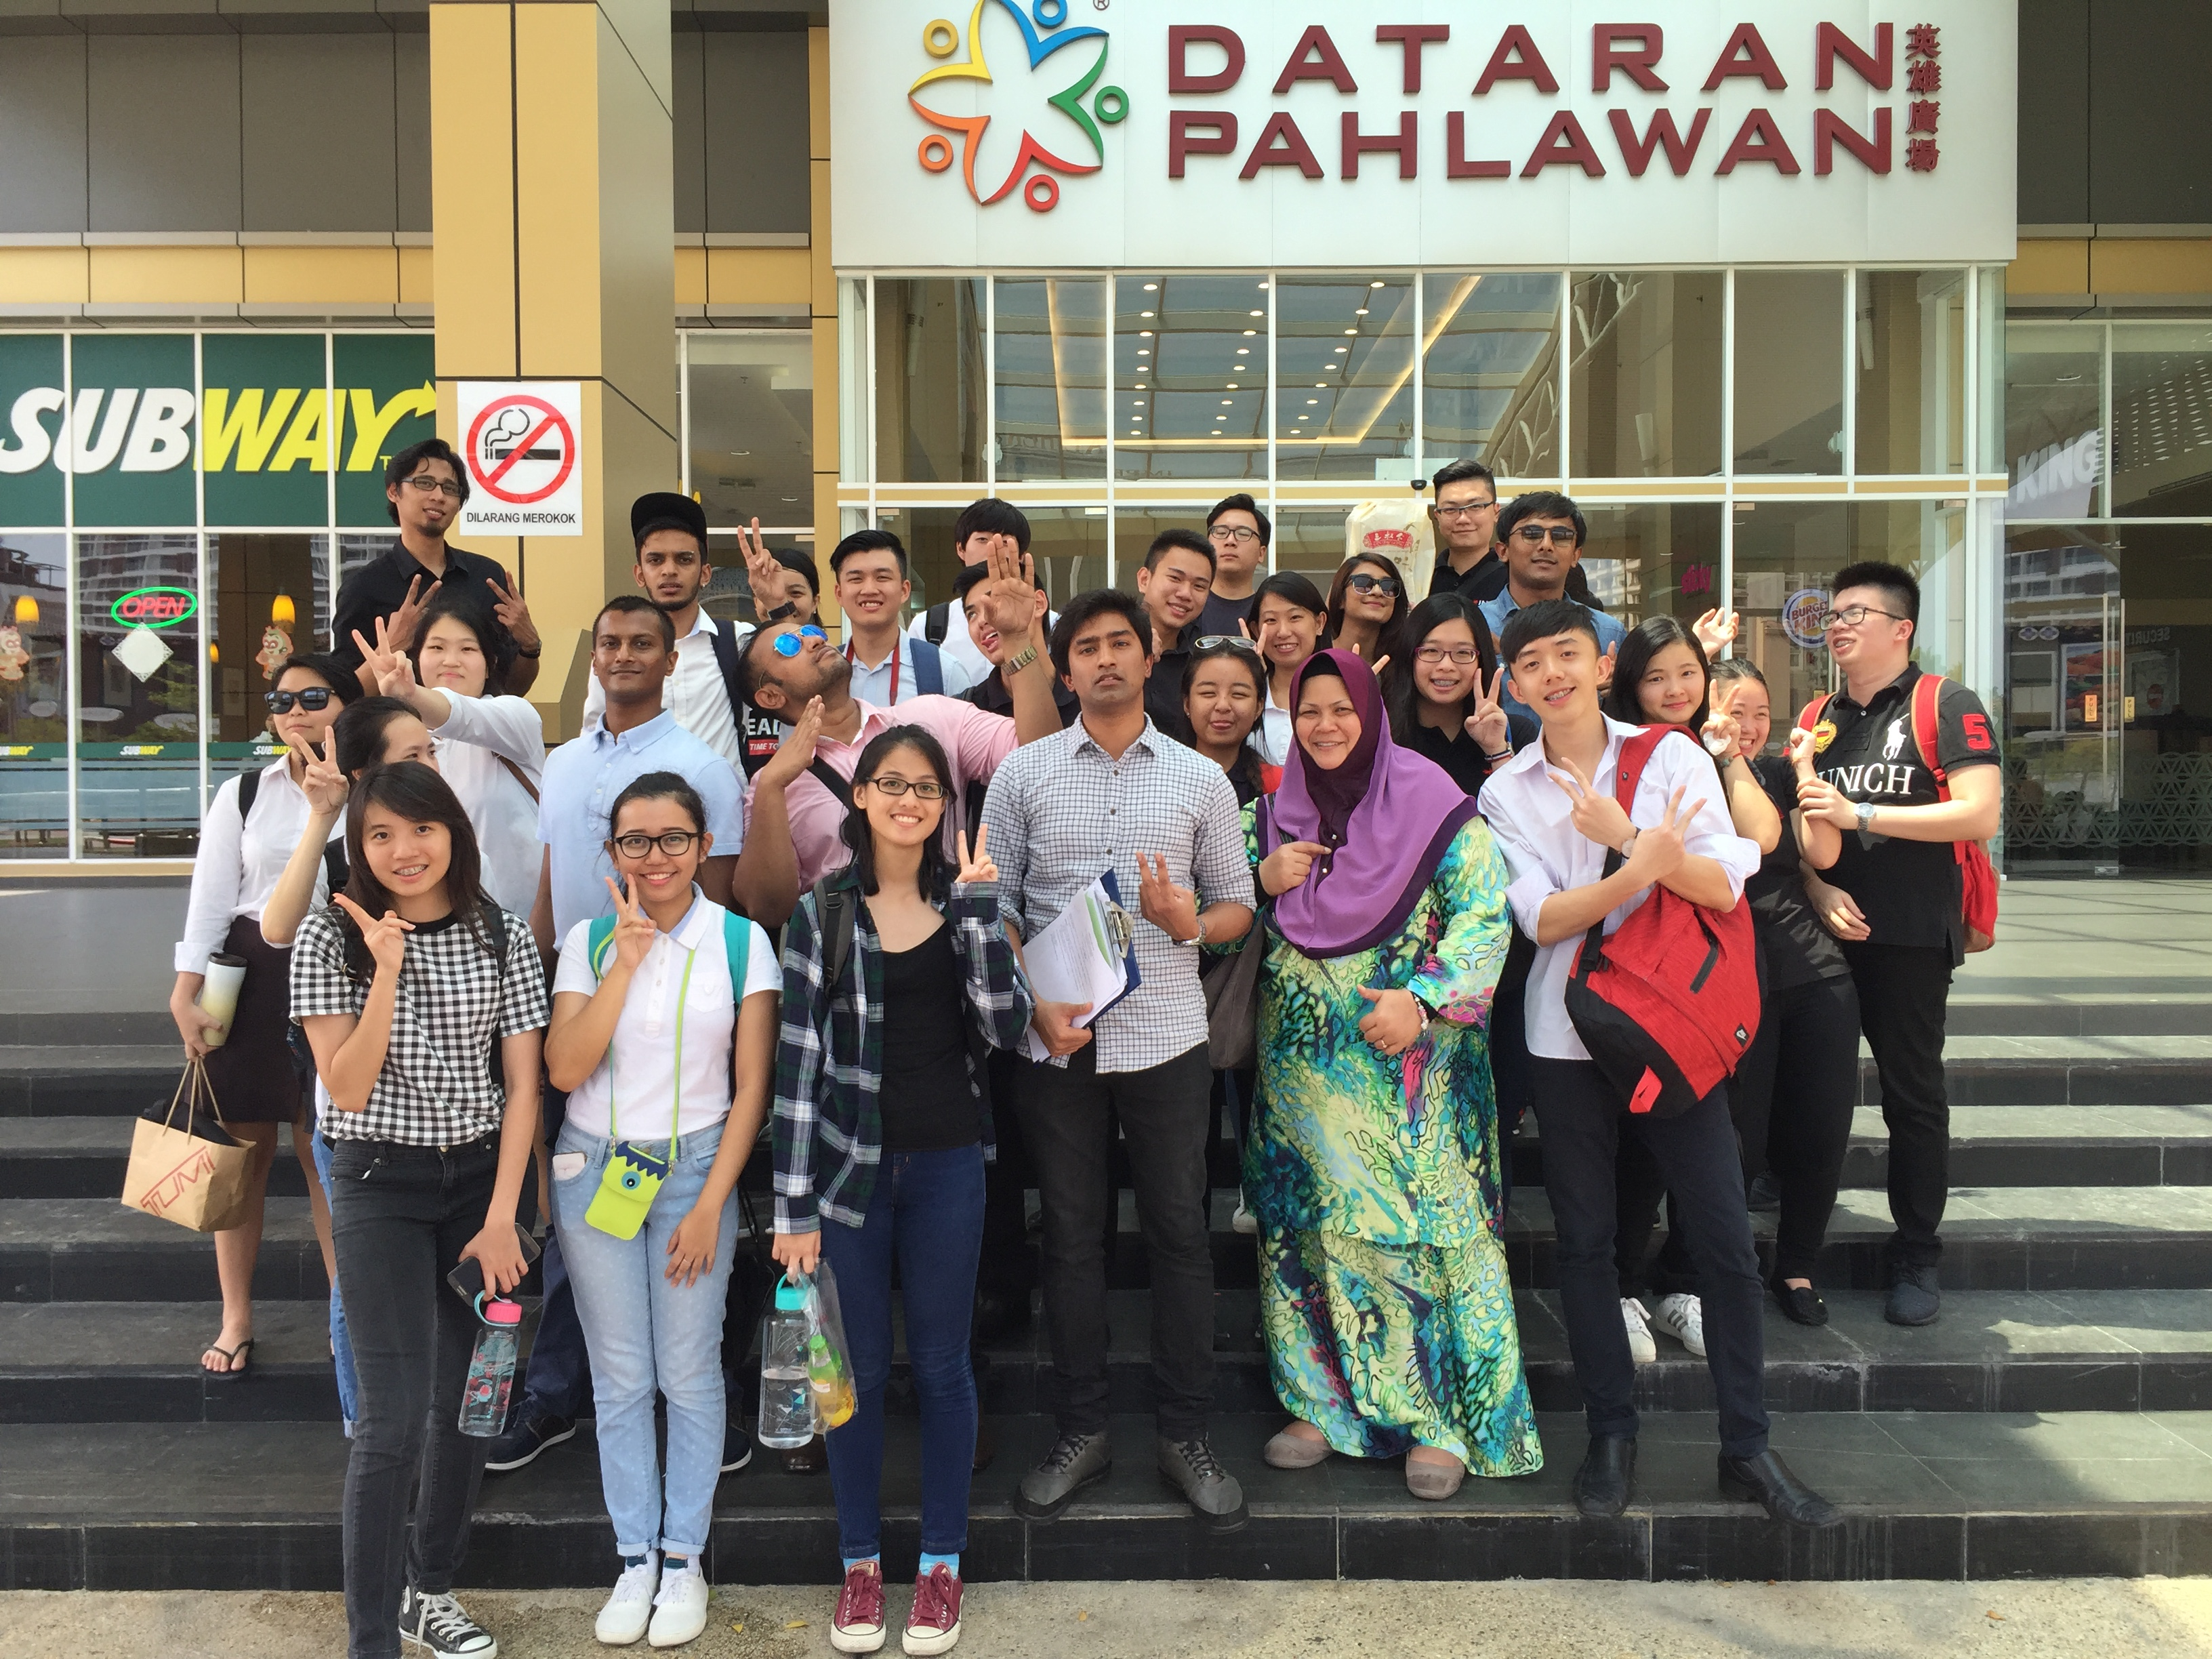 Melaka educational trip with Riaz